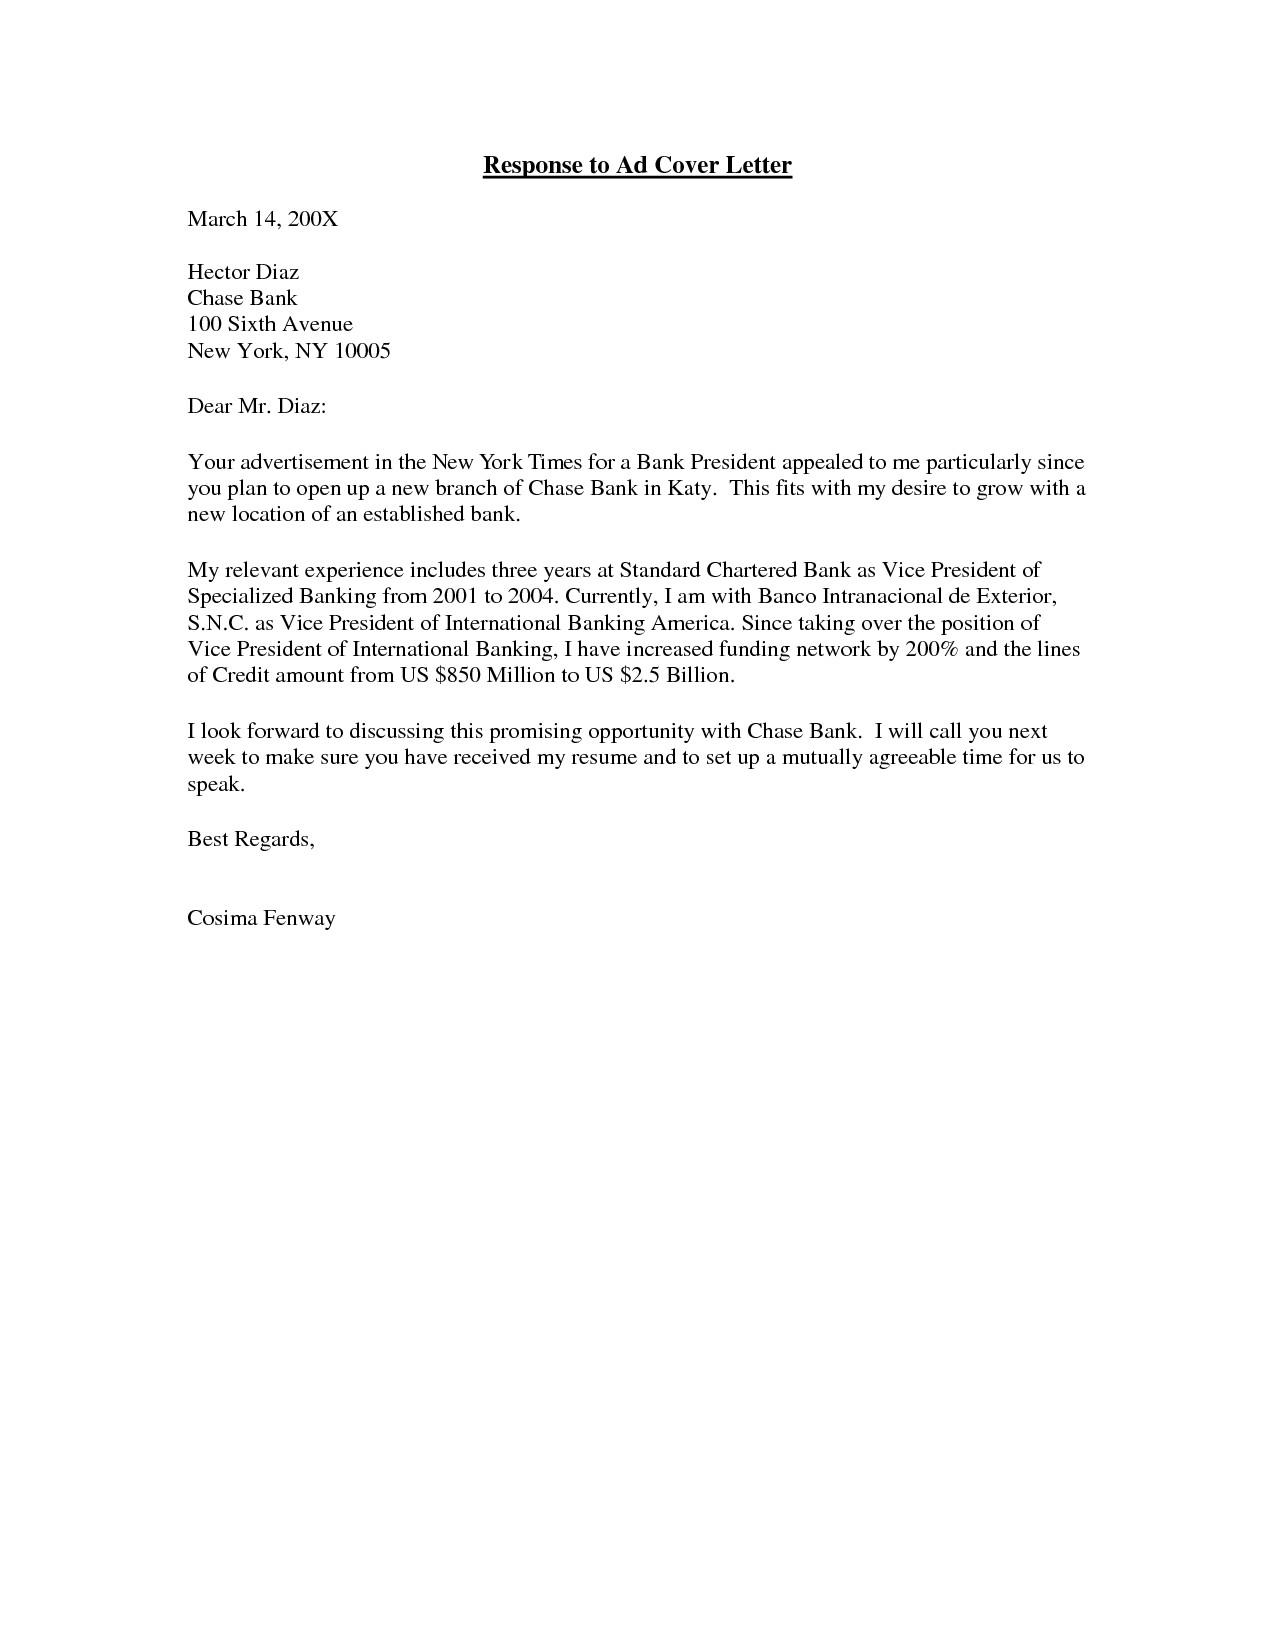 cover letter samples for job posting elegant cover letter for no job posting adriangatton com